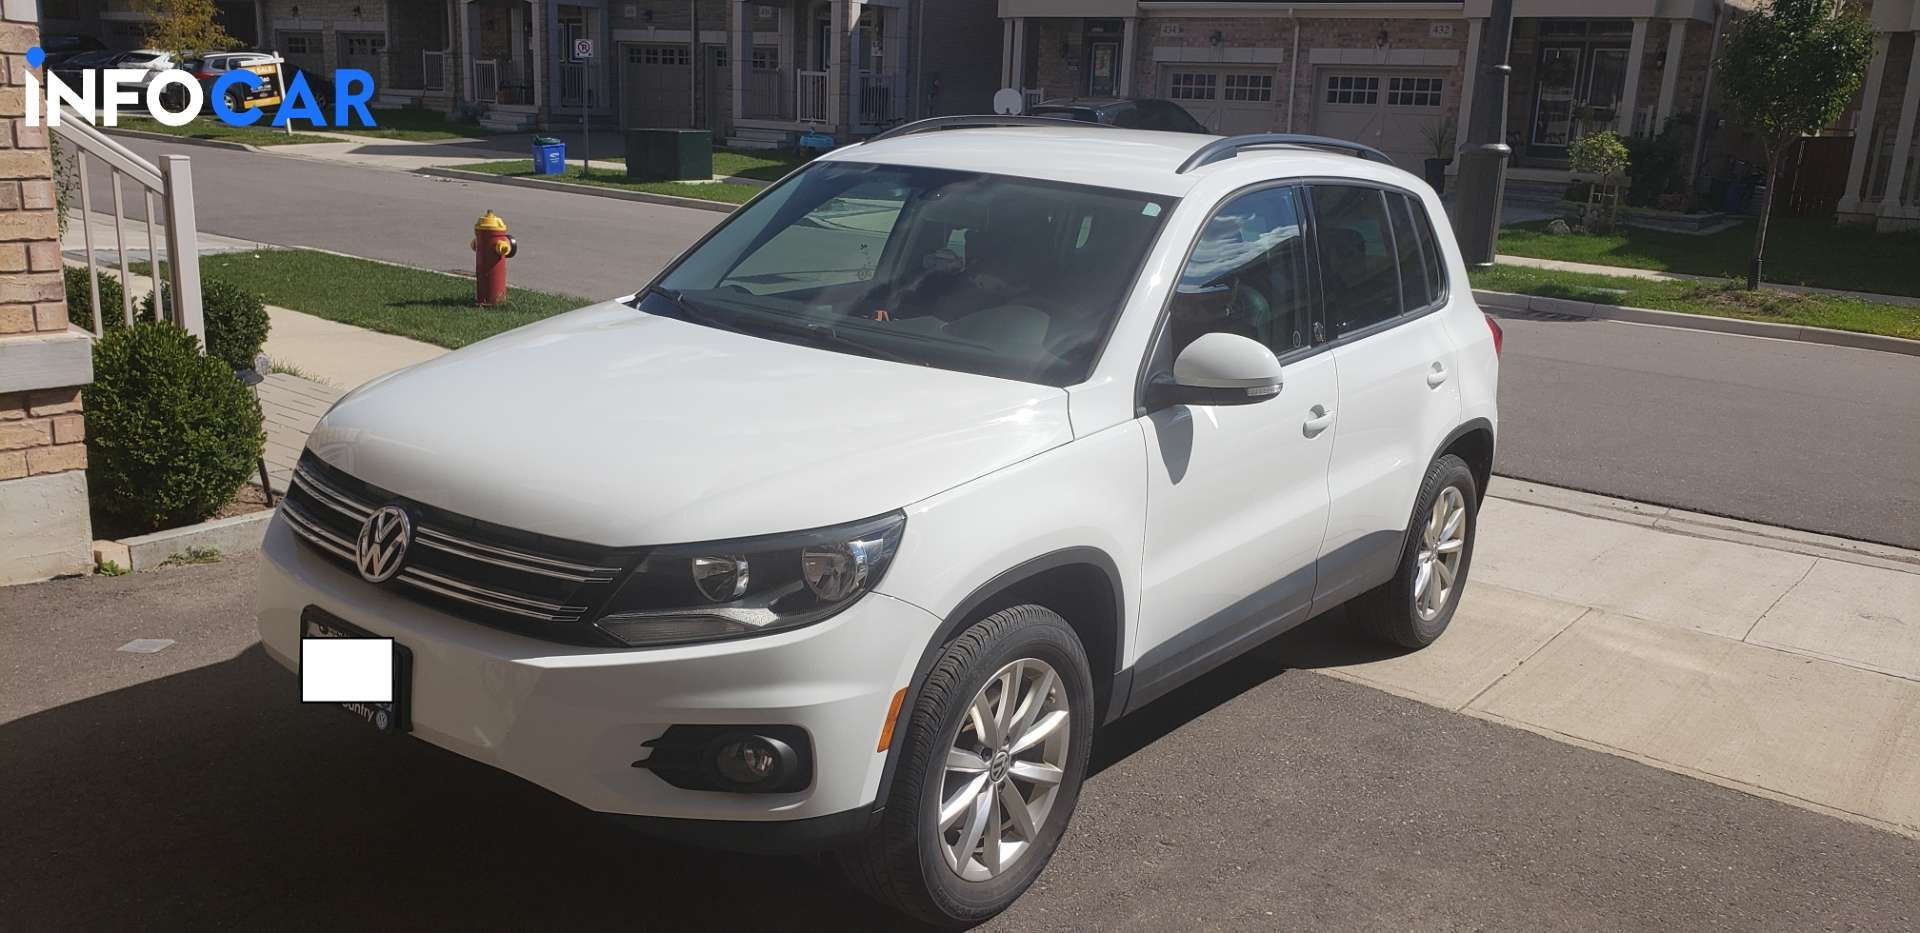 2017 Volkswagen Tiguan null - INFOCAR - Toronto Auto Trading Platform